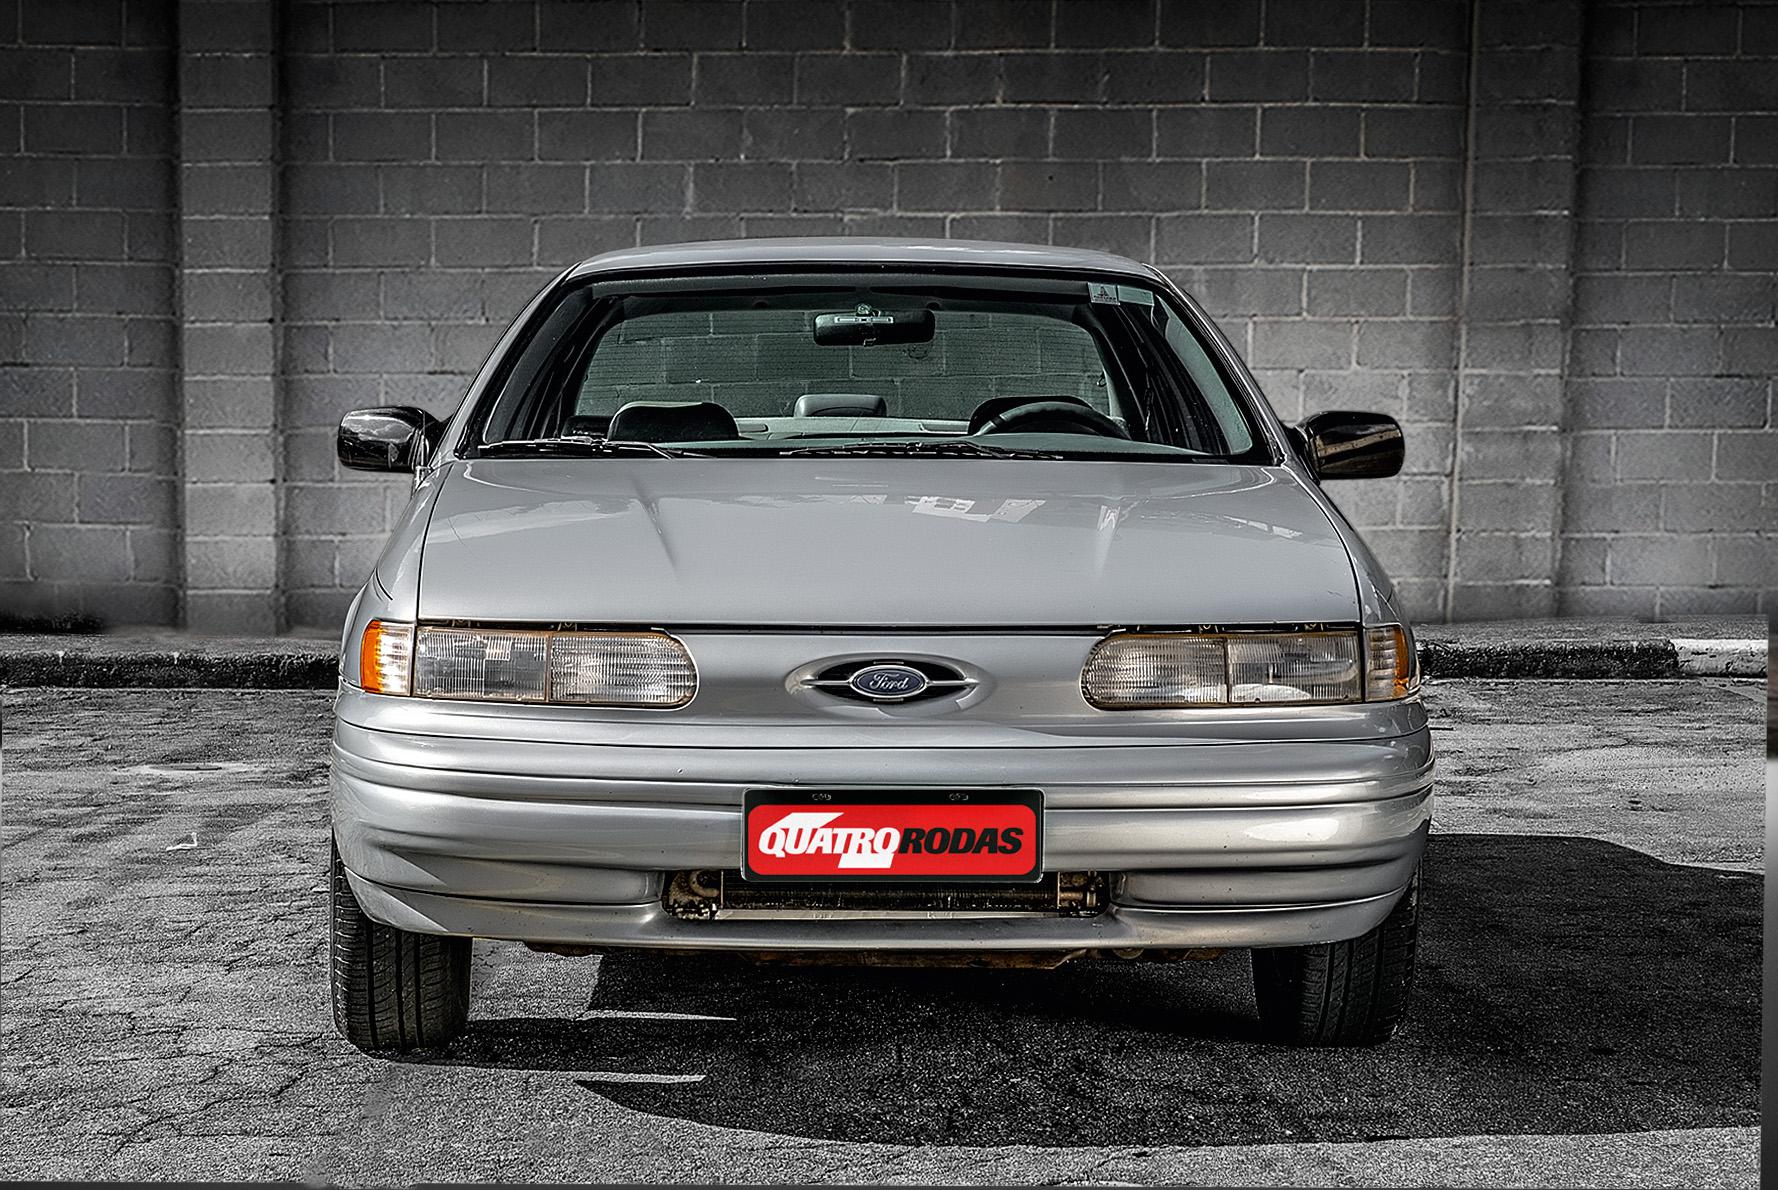 Ford Taurus GL 1994 Dianteira.